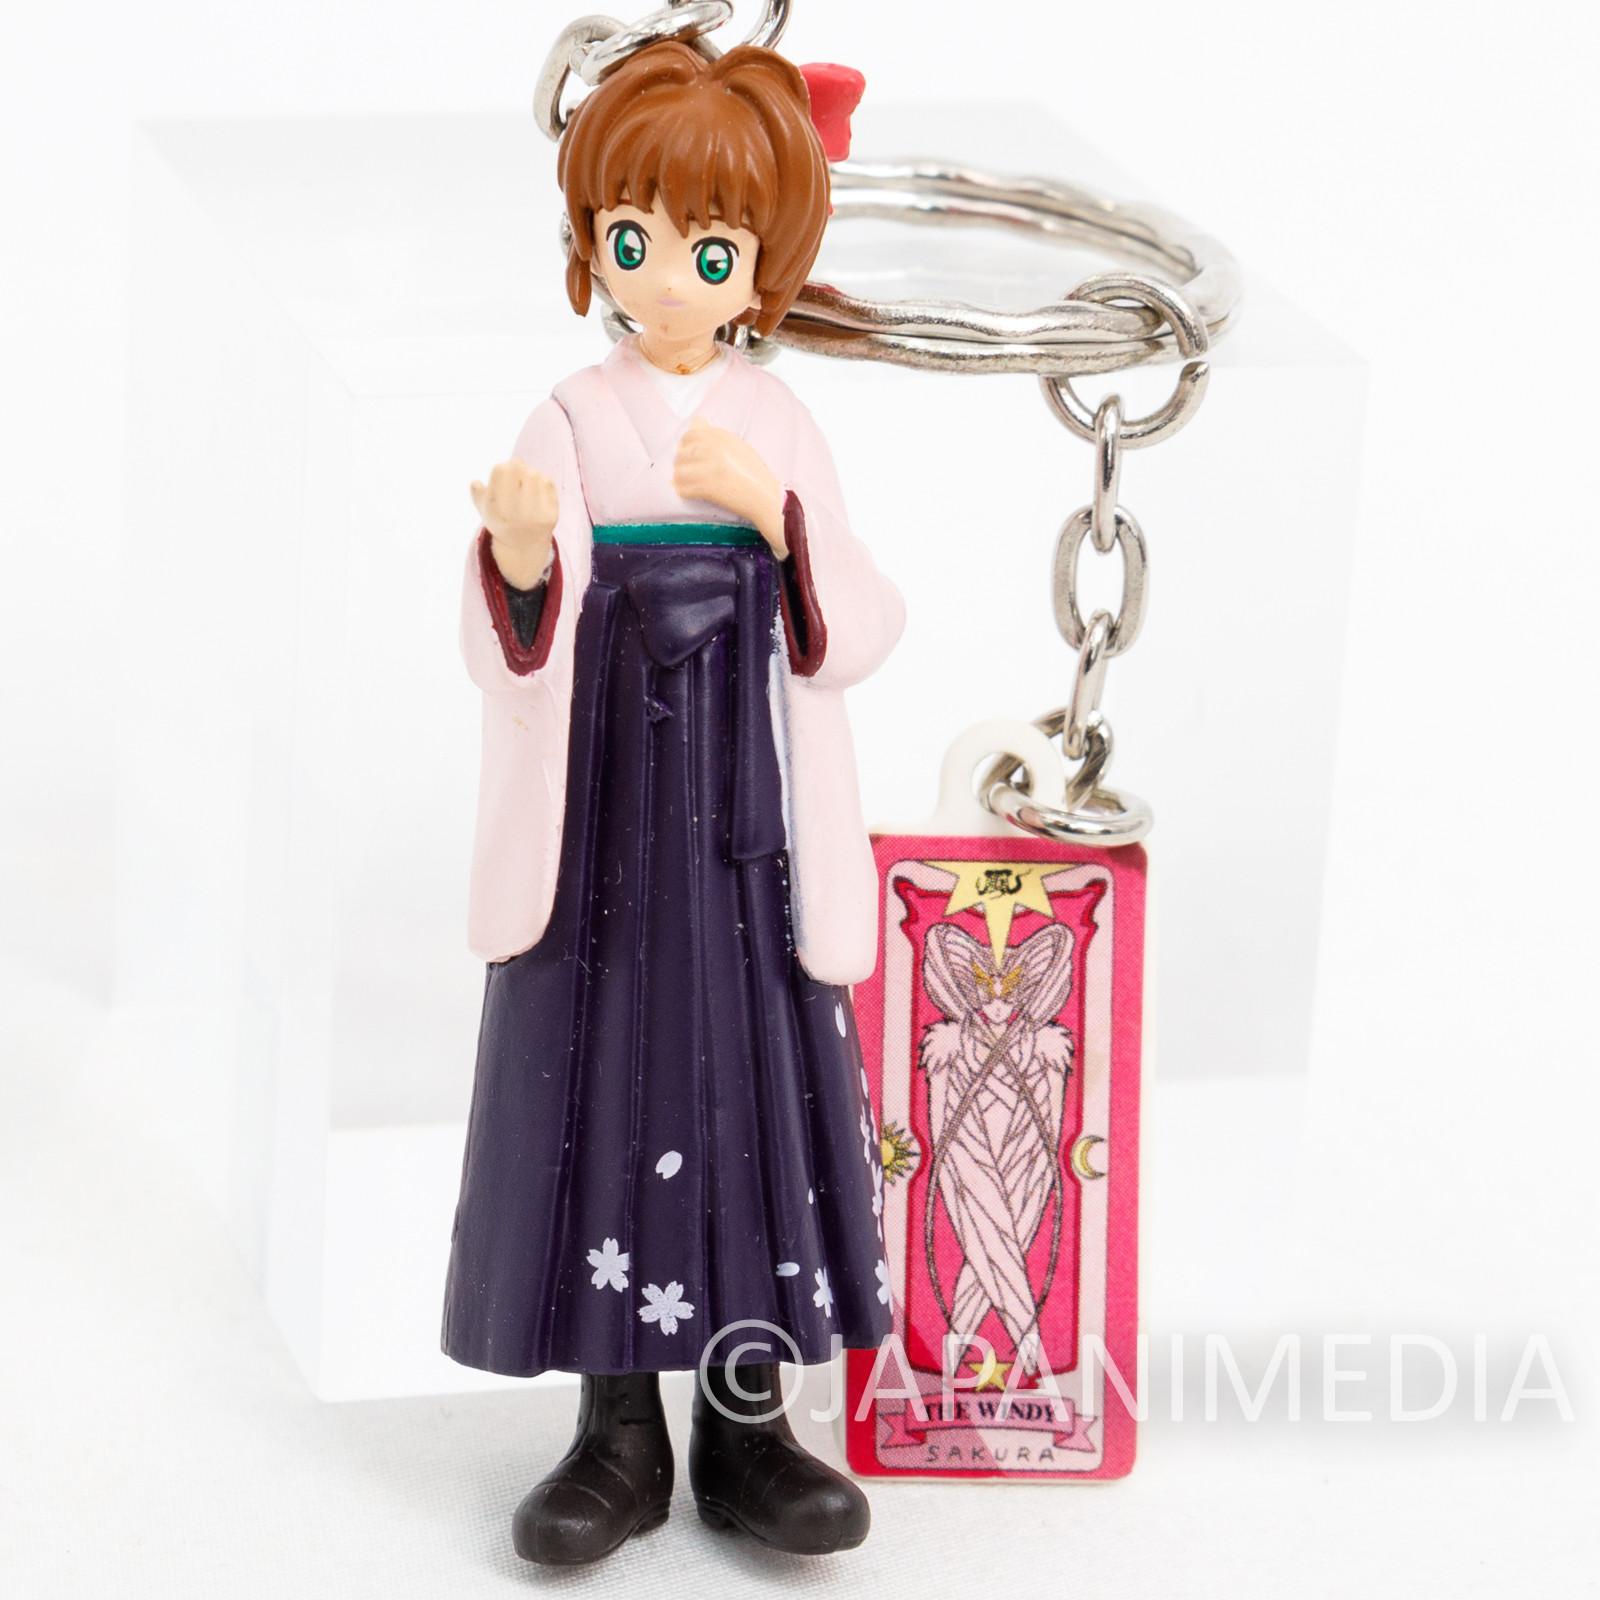 Cardcaptor Sakura Hakama ver. Figure Keychain CLAMP JAPAN ANIME